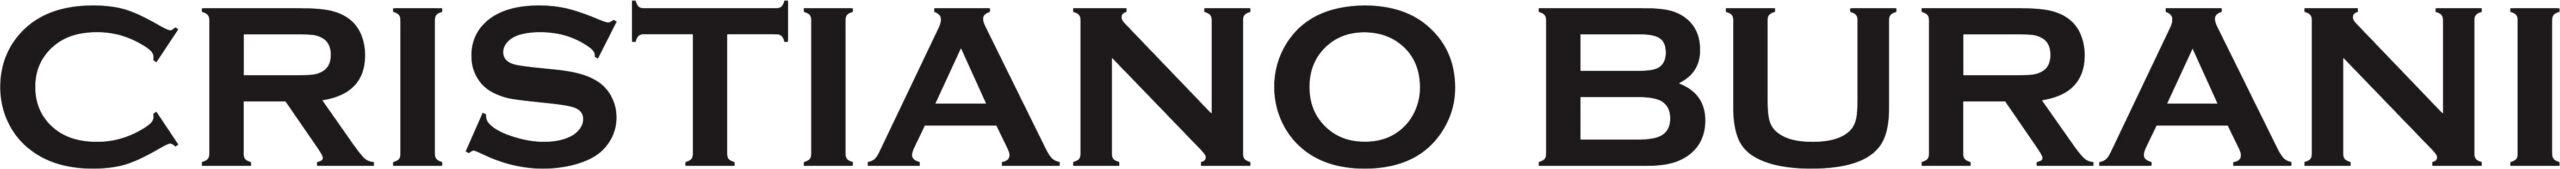 Cristiano Burani Logo